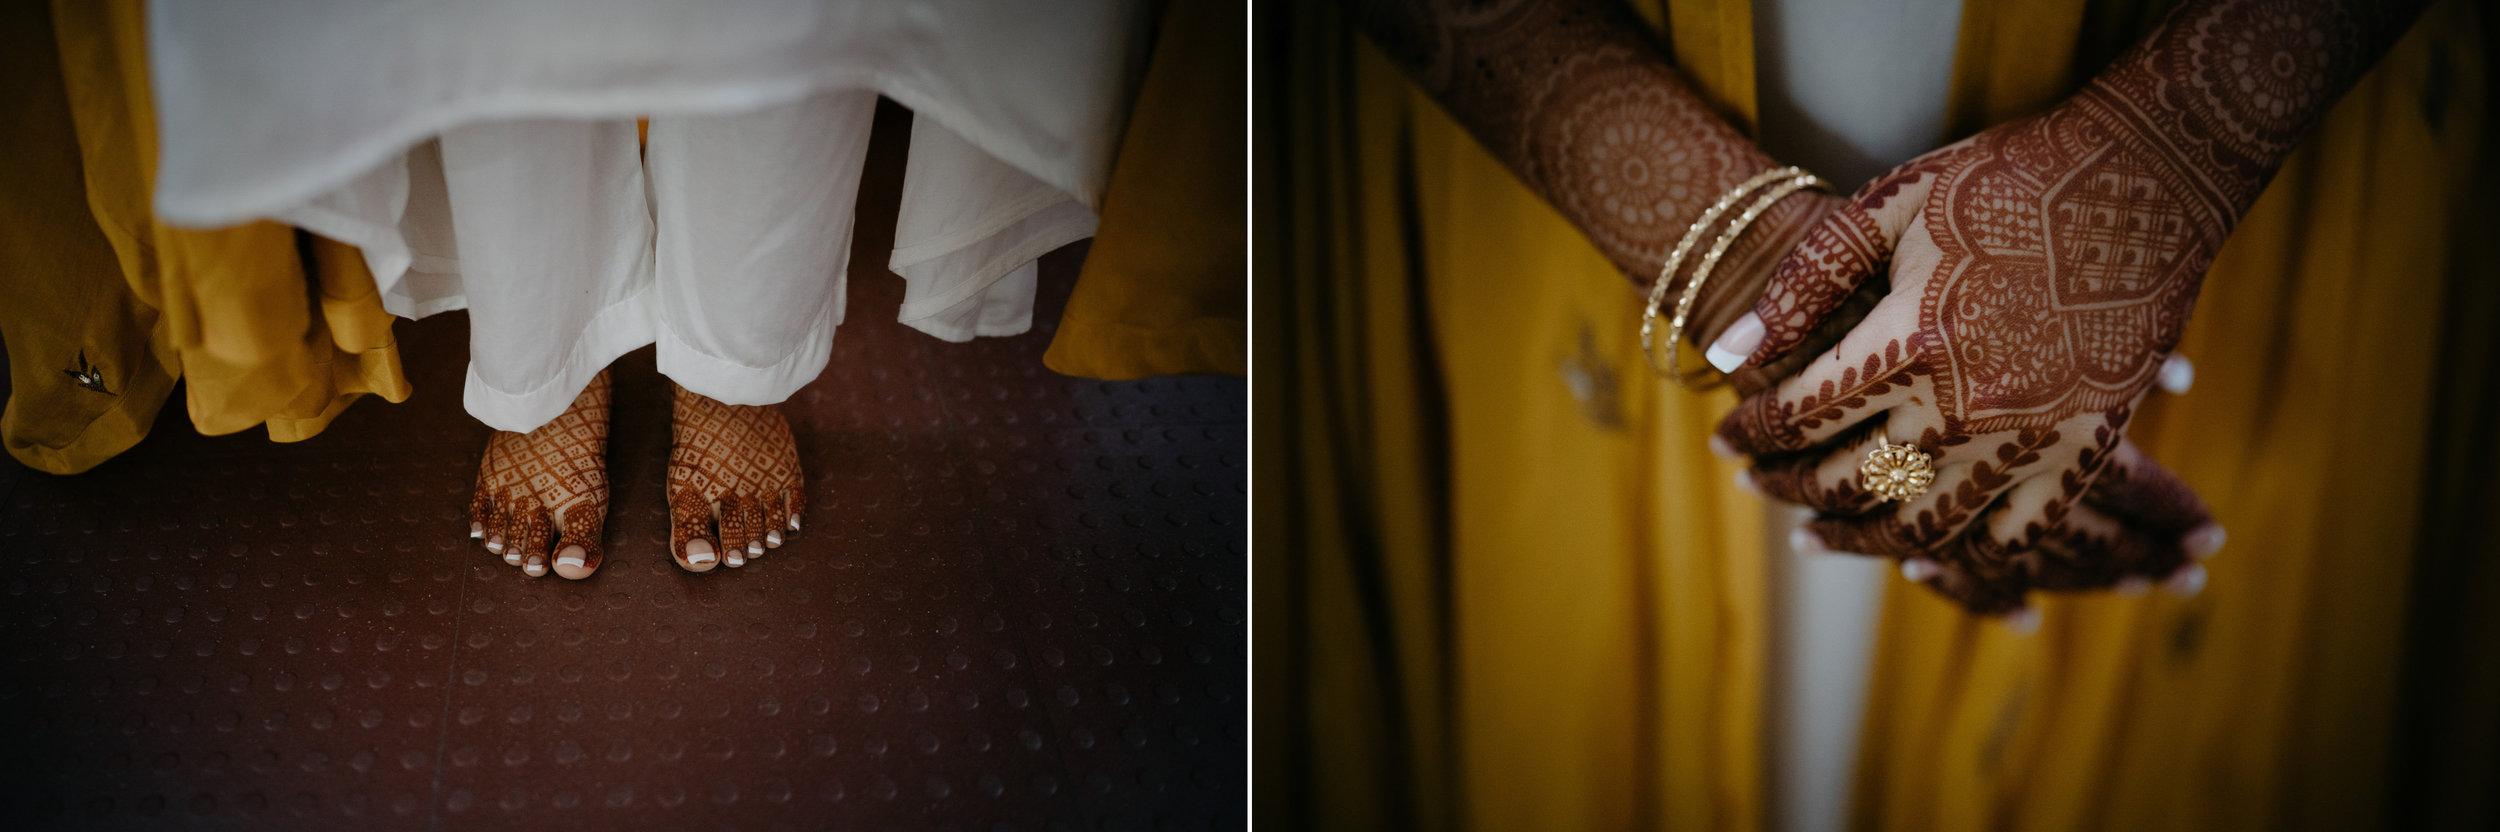 indian wedding details tanzania destination